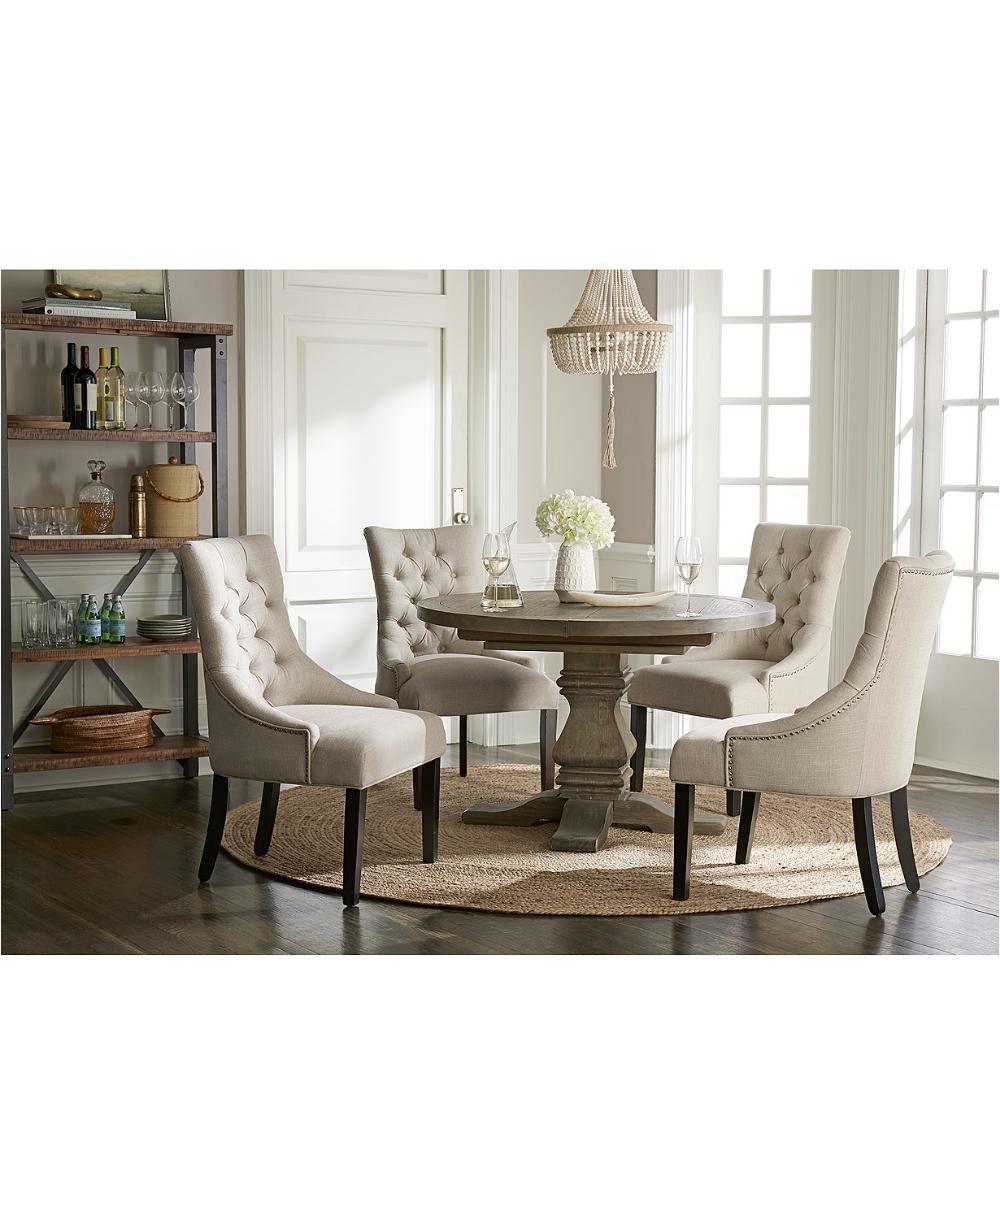 Venta > round dining table set macys > en stock